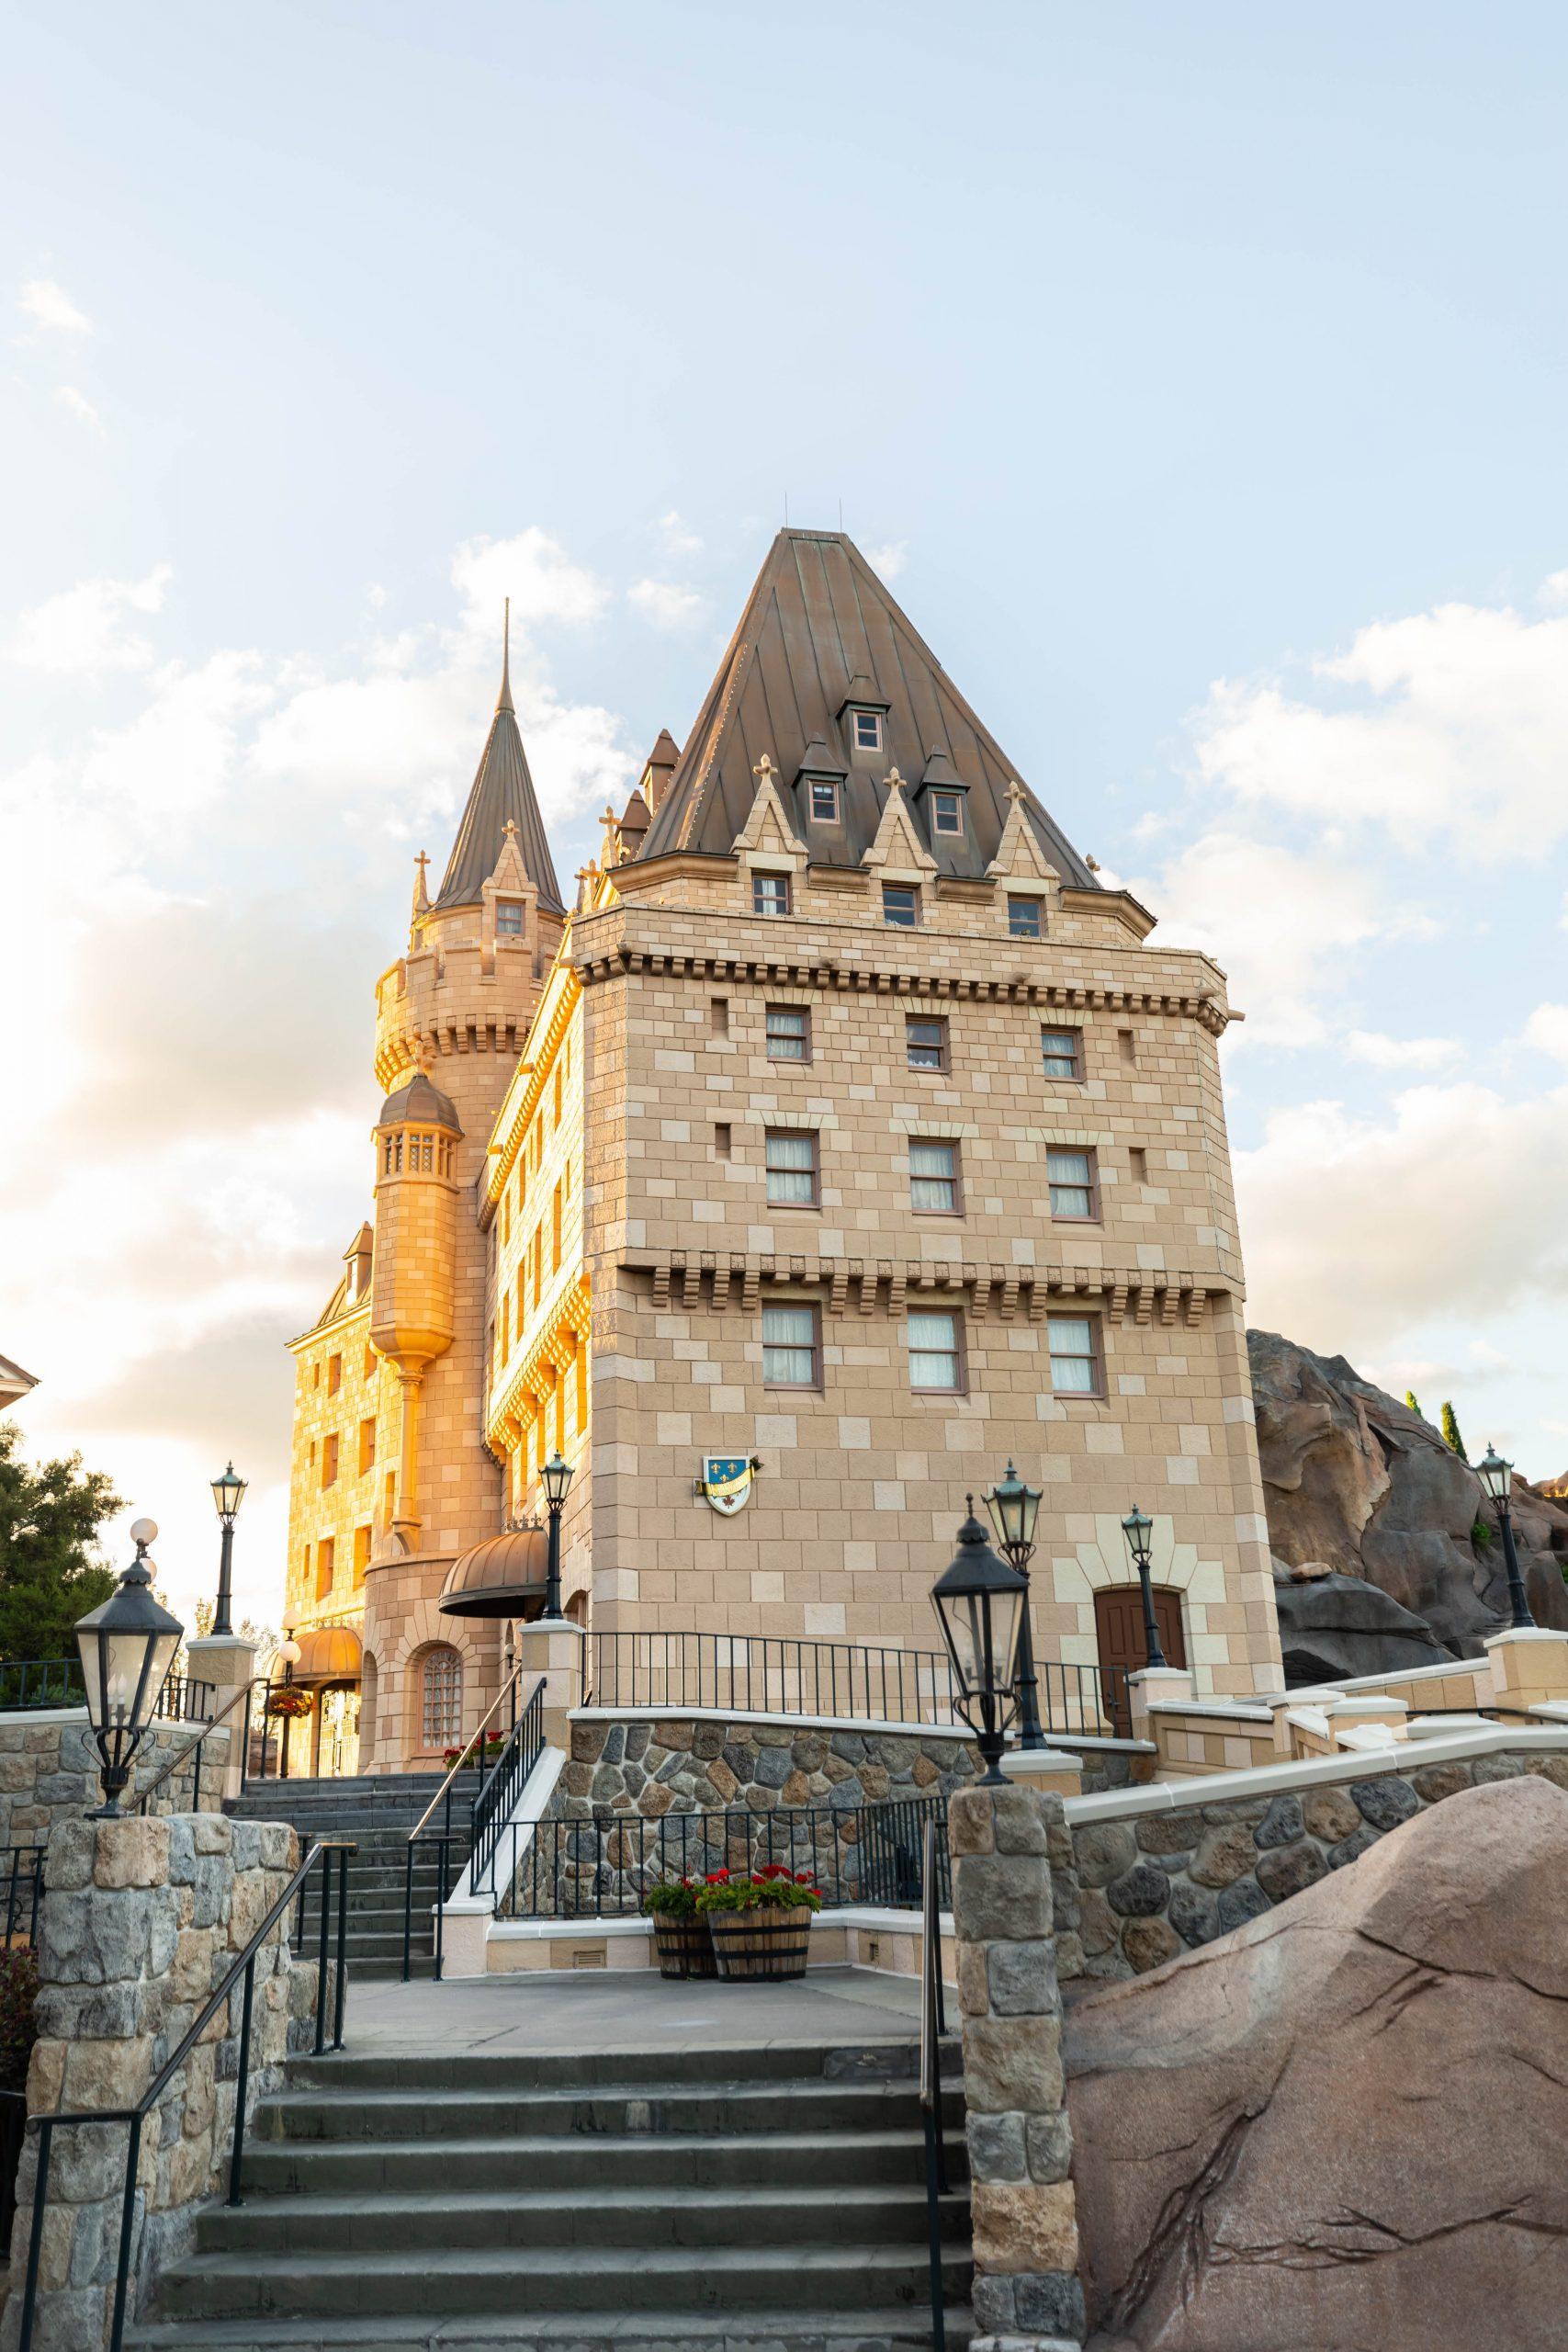 Hotel du Canada aka Fairmont Chateau Laurier in Canada at Epcot Walt Disney World by Luxury Travel Writer Annie Fairfax